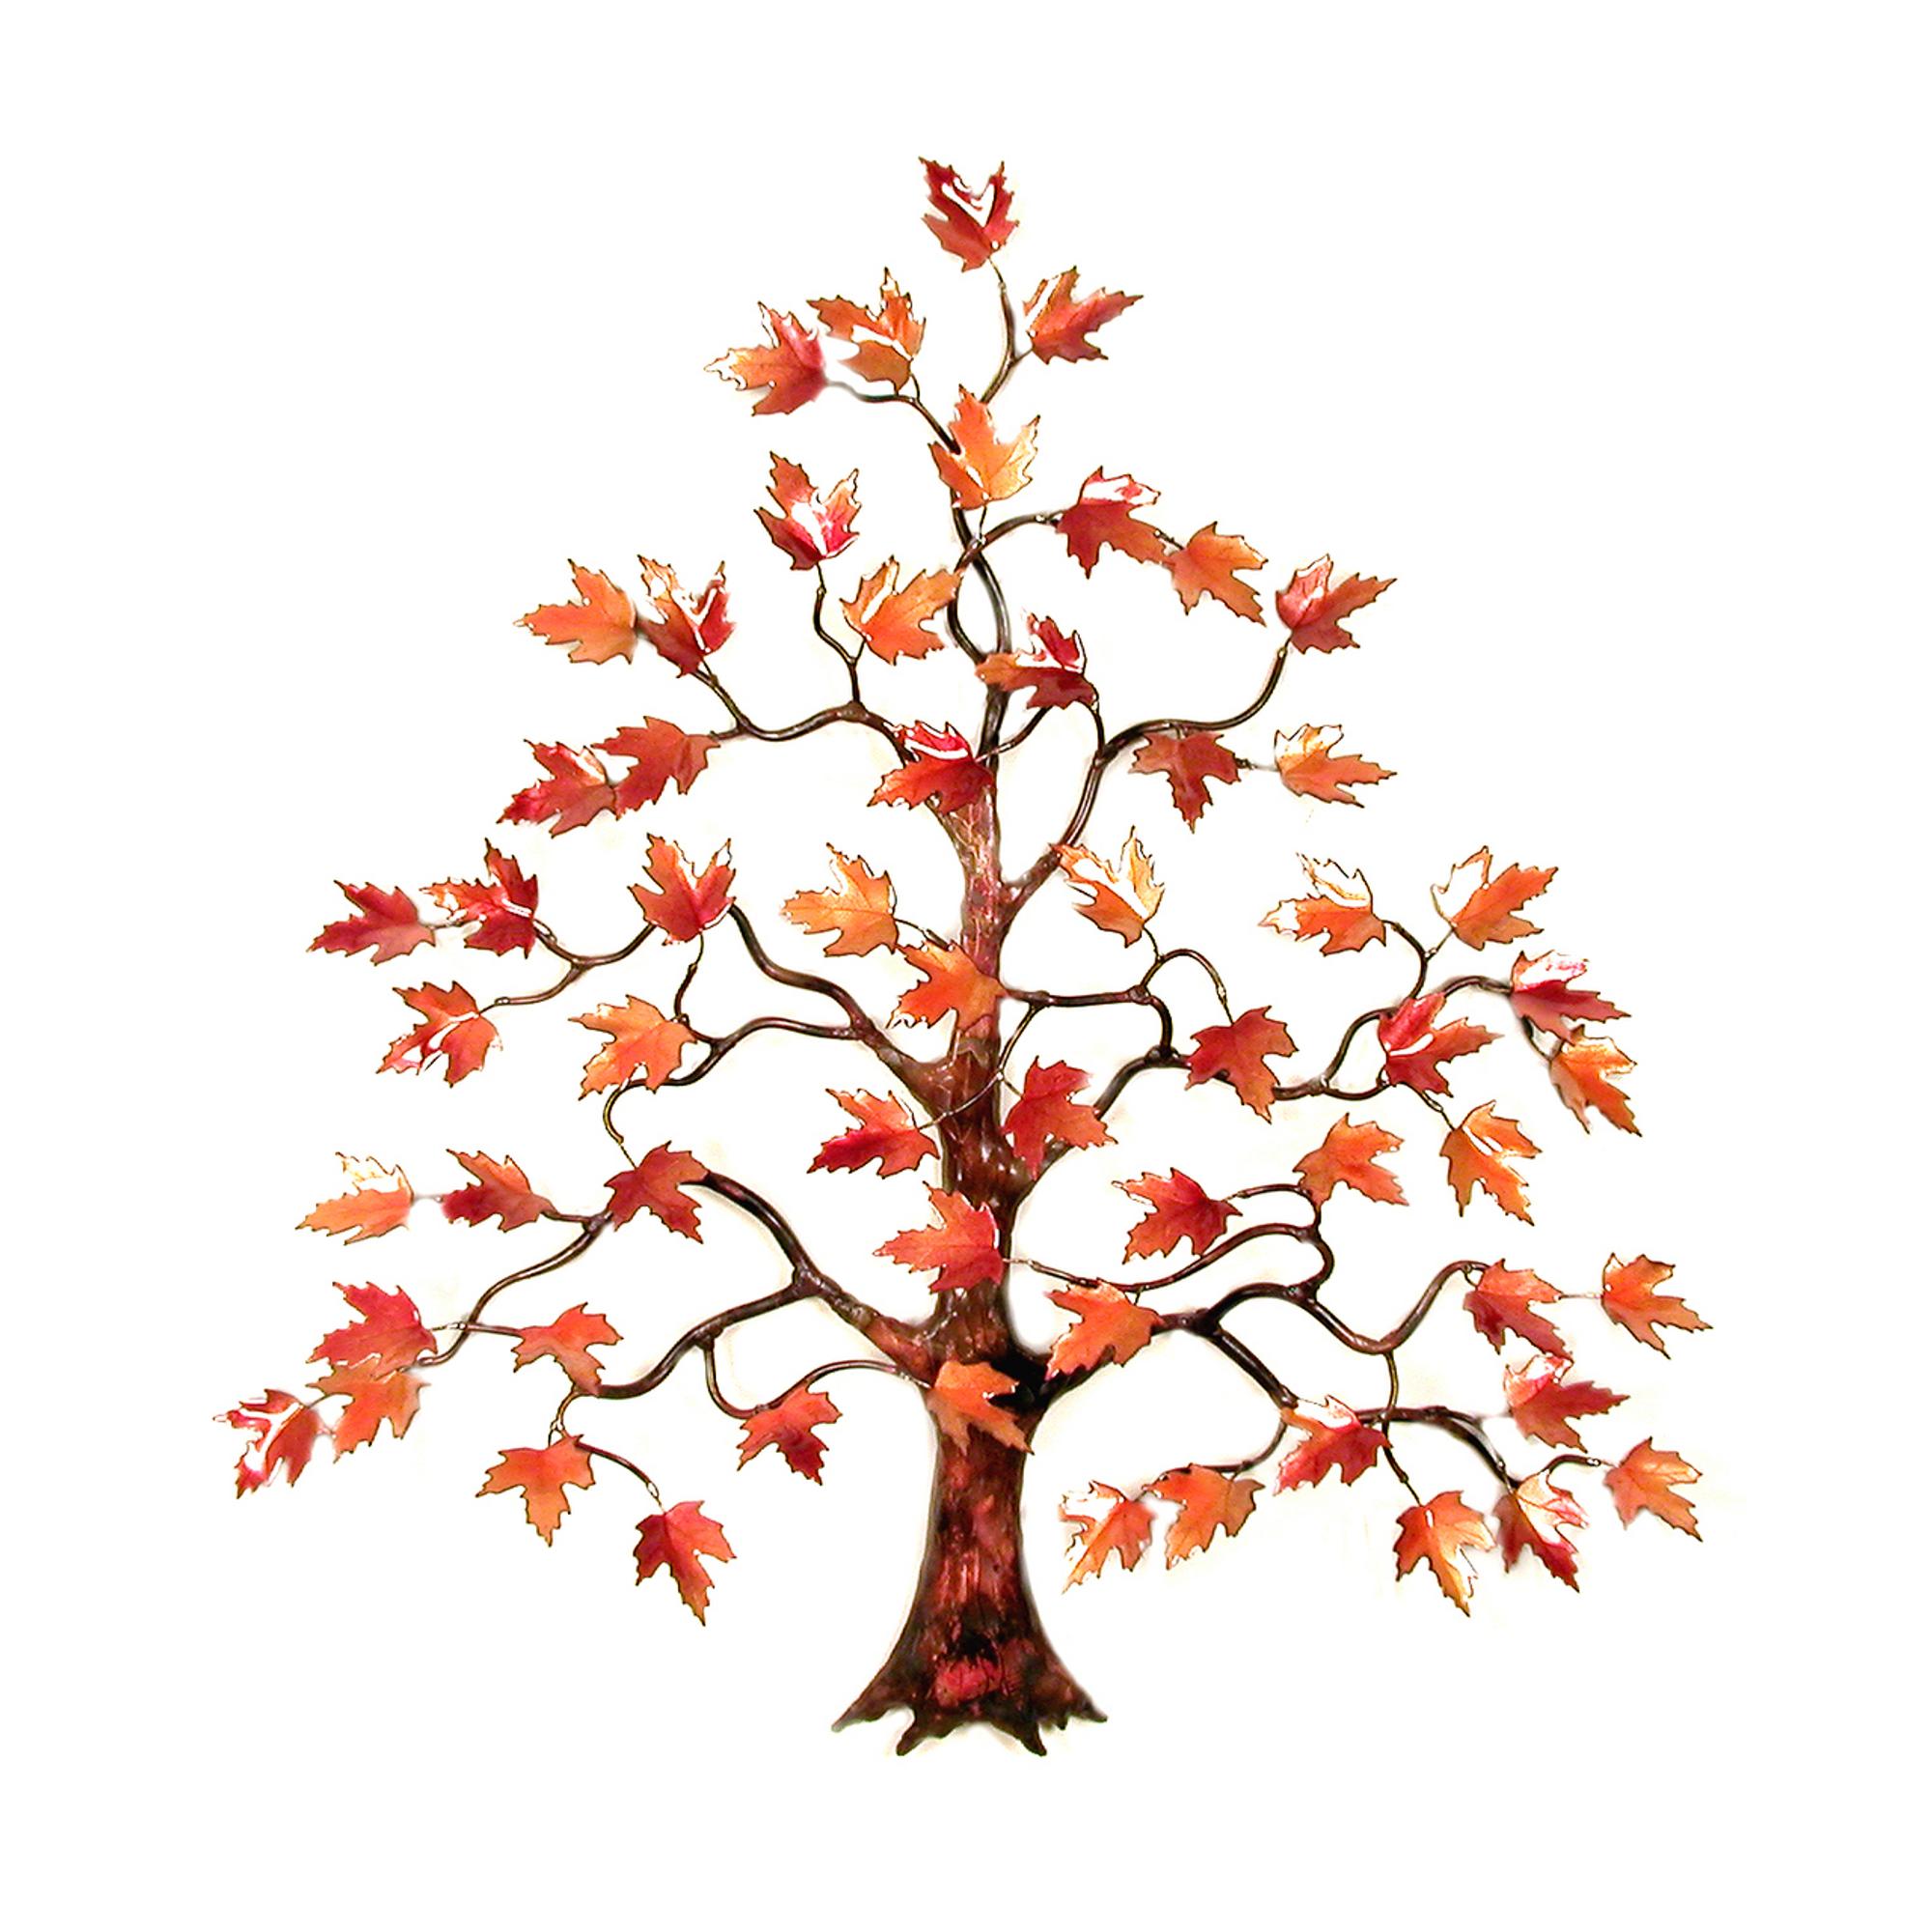 Bovano Red Maple Tree Enameled Copper Leaves Wall Art Bovano Of Cheshire Red Maple Tree Wall Sculpture